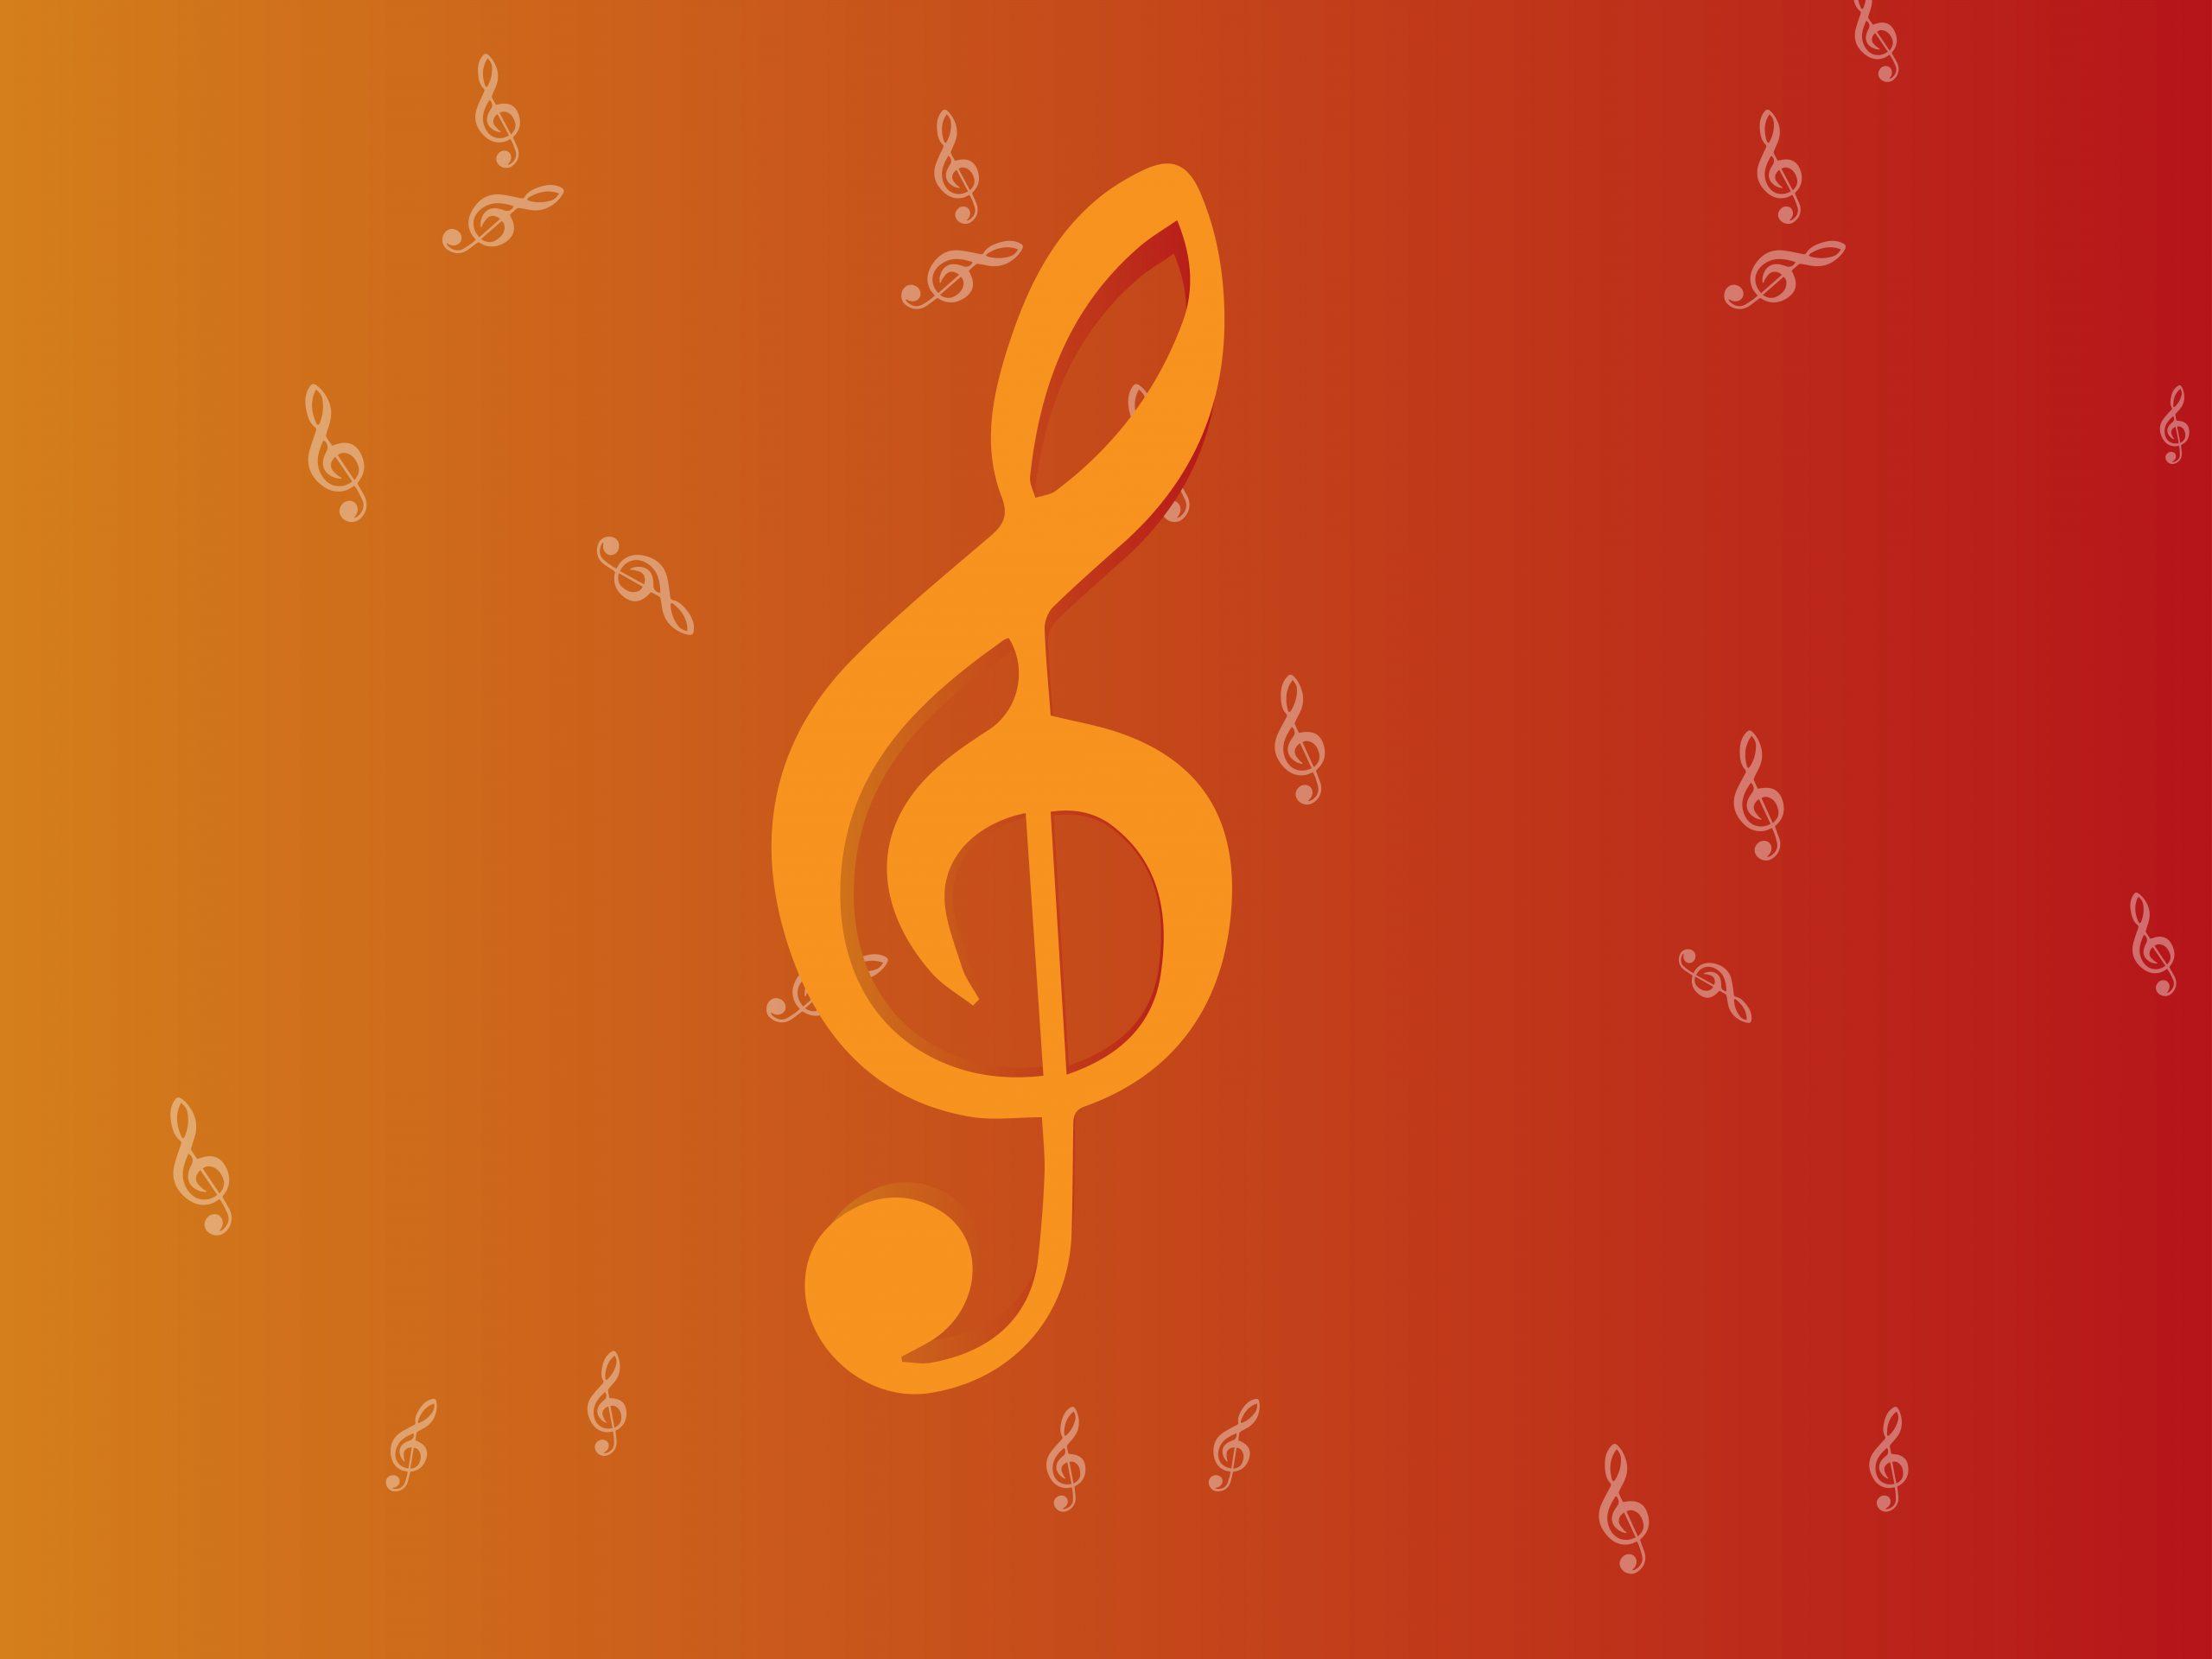 Musical wallpaper illustration